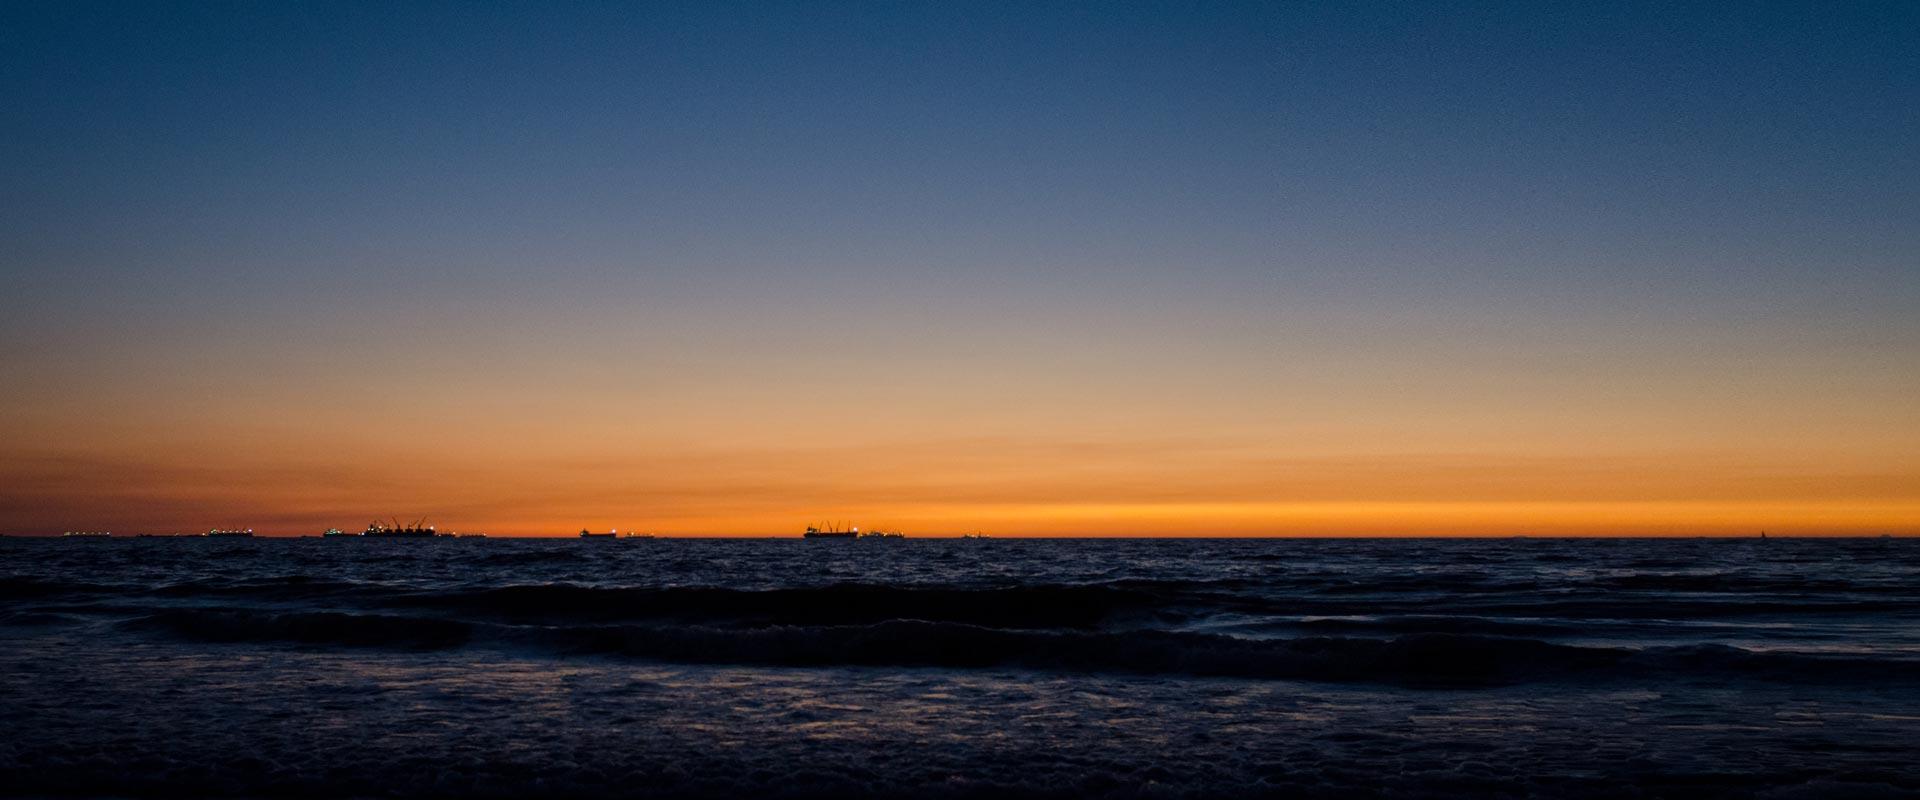 Candolim Beach – Twilight Sky